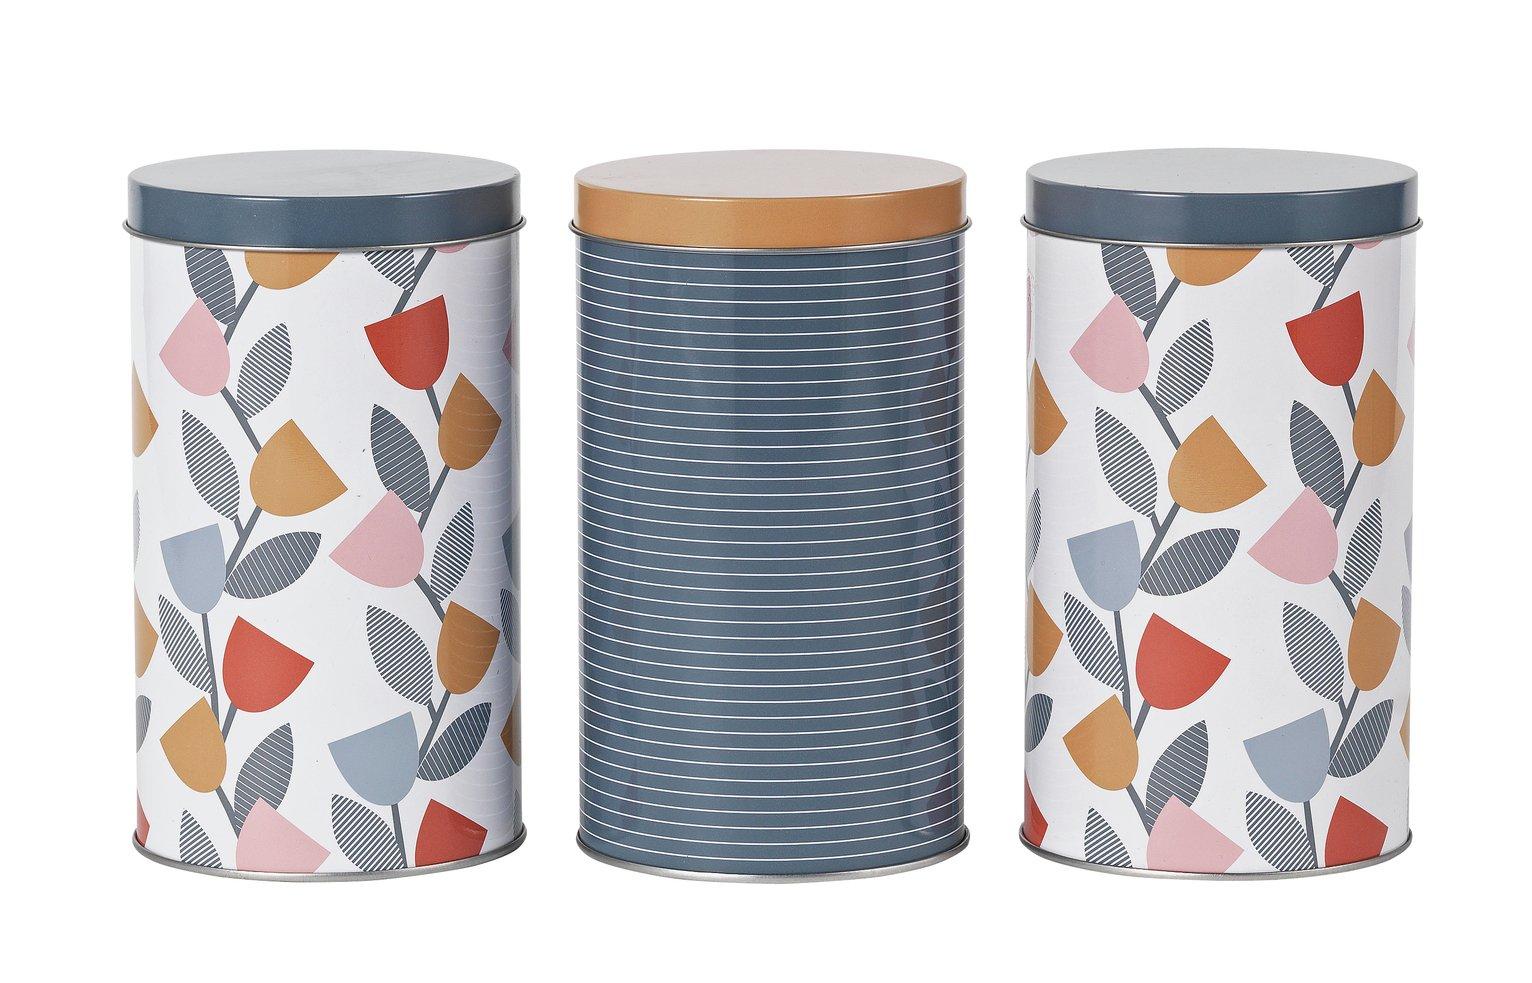 Argos Home Apartment Apparel Storage Tins - 3 Pack £7.50